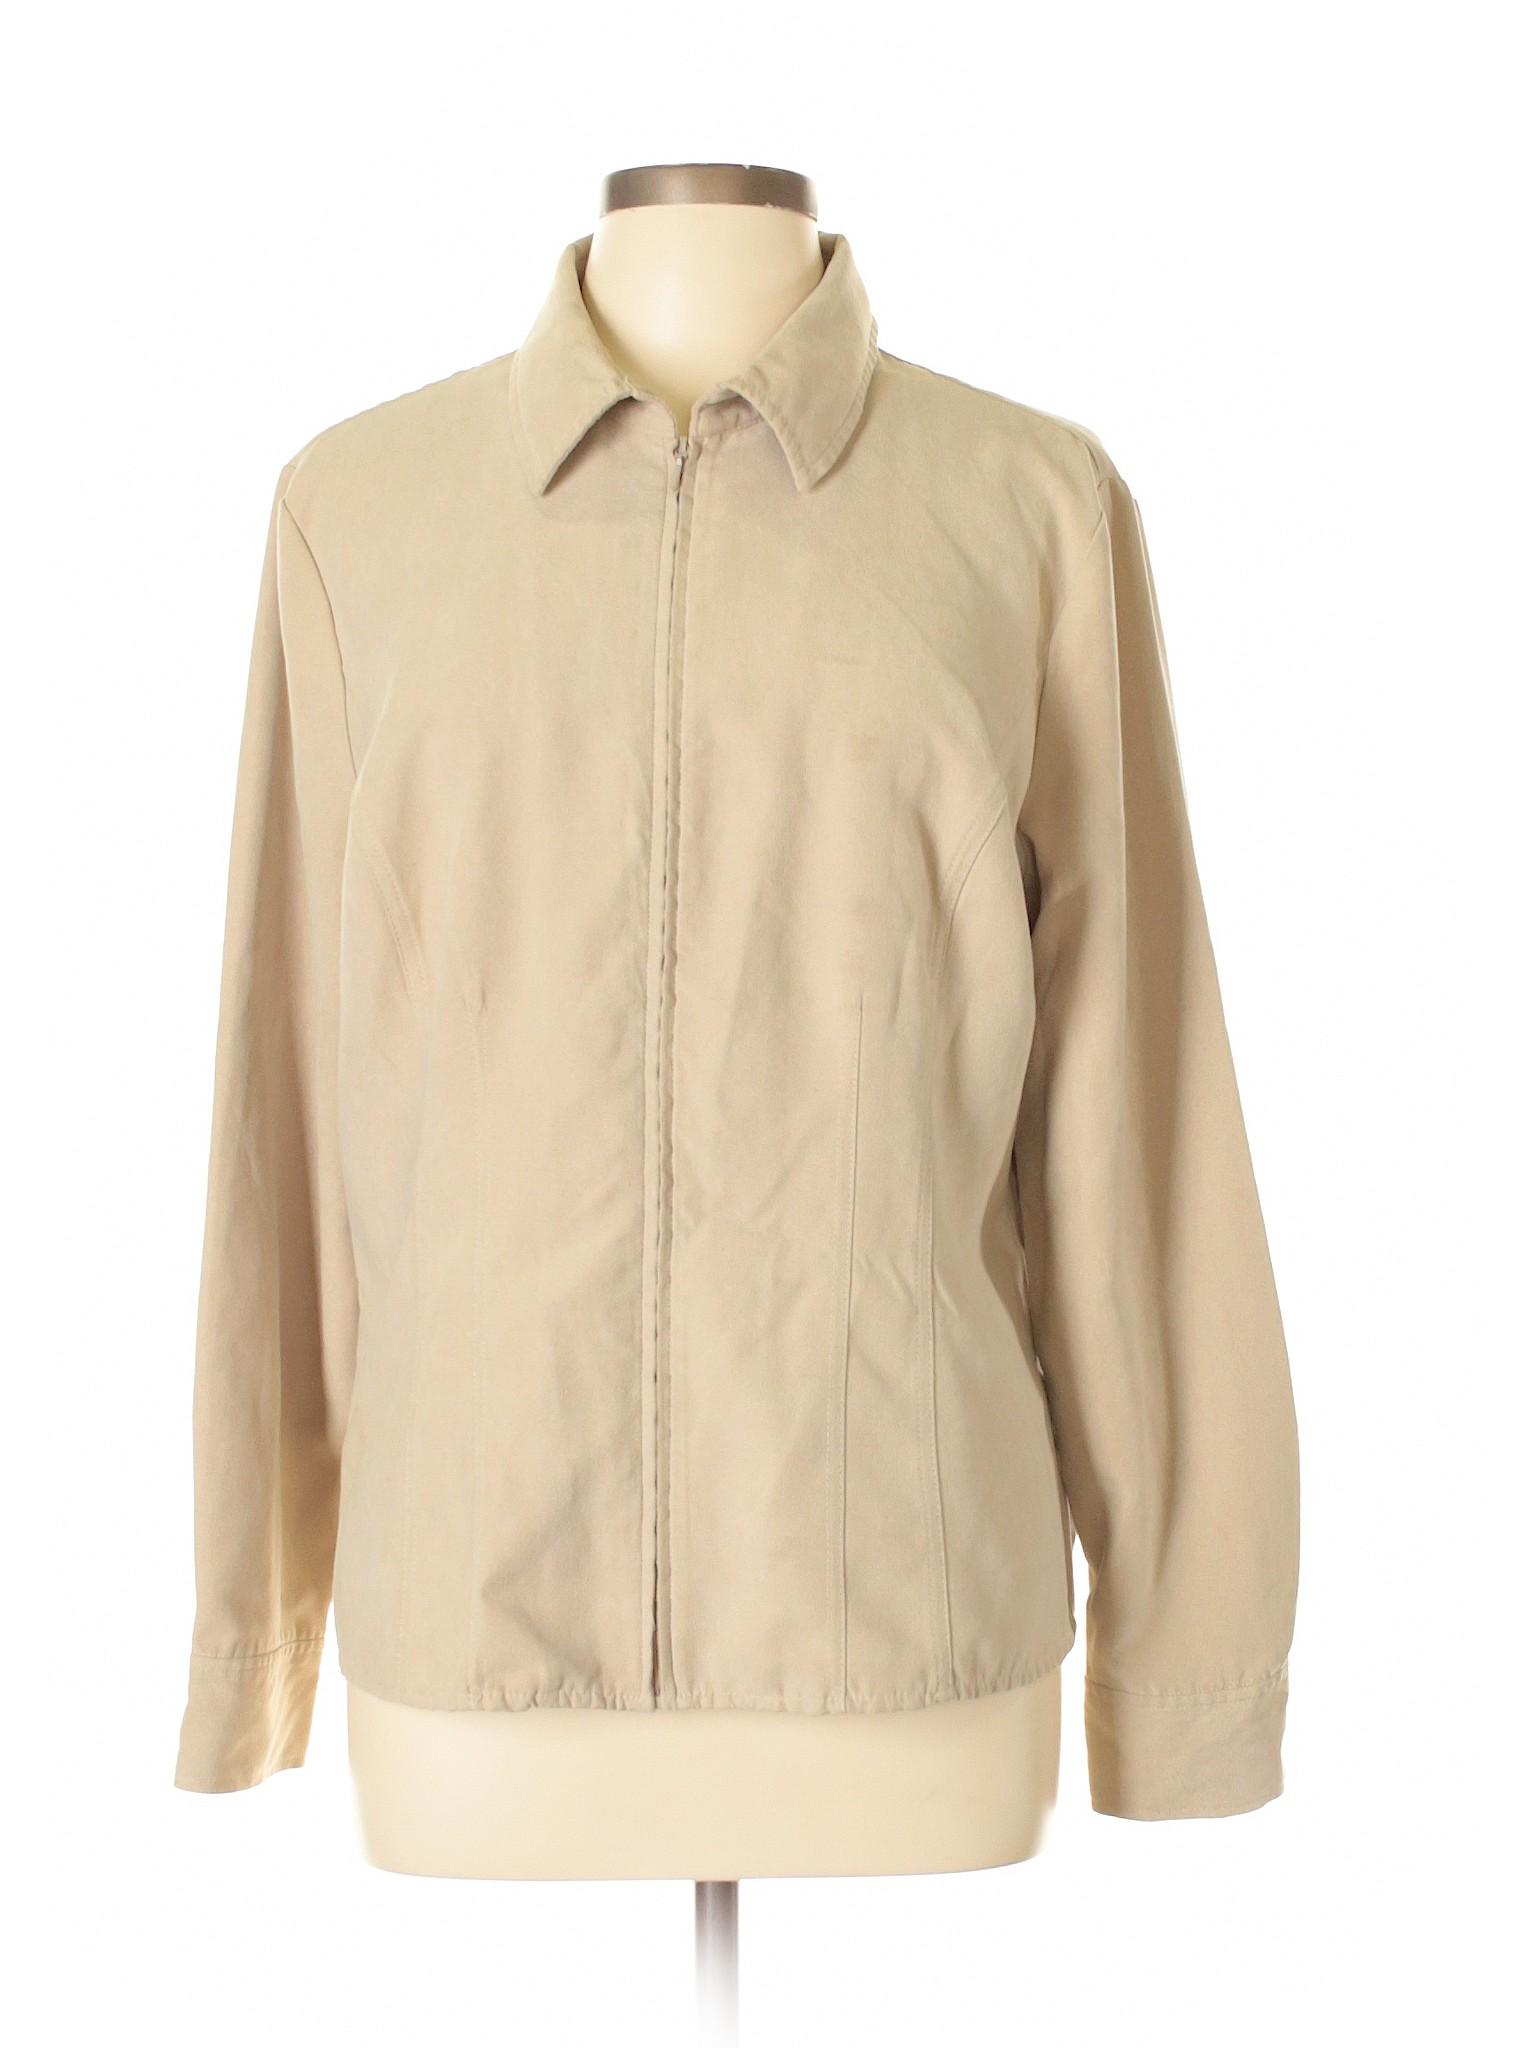 leisure SONOMA life Boutique Jacket style a4pwOxwq7